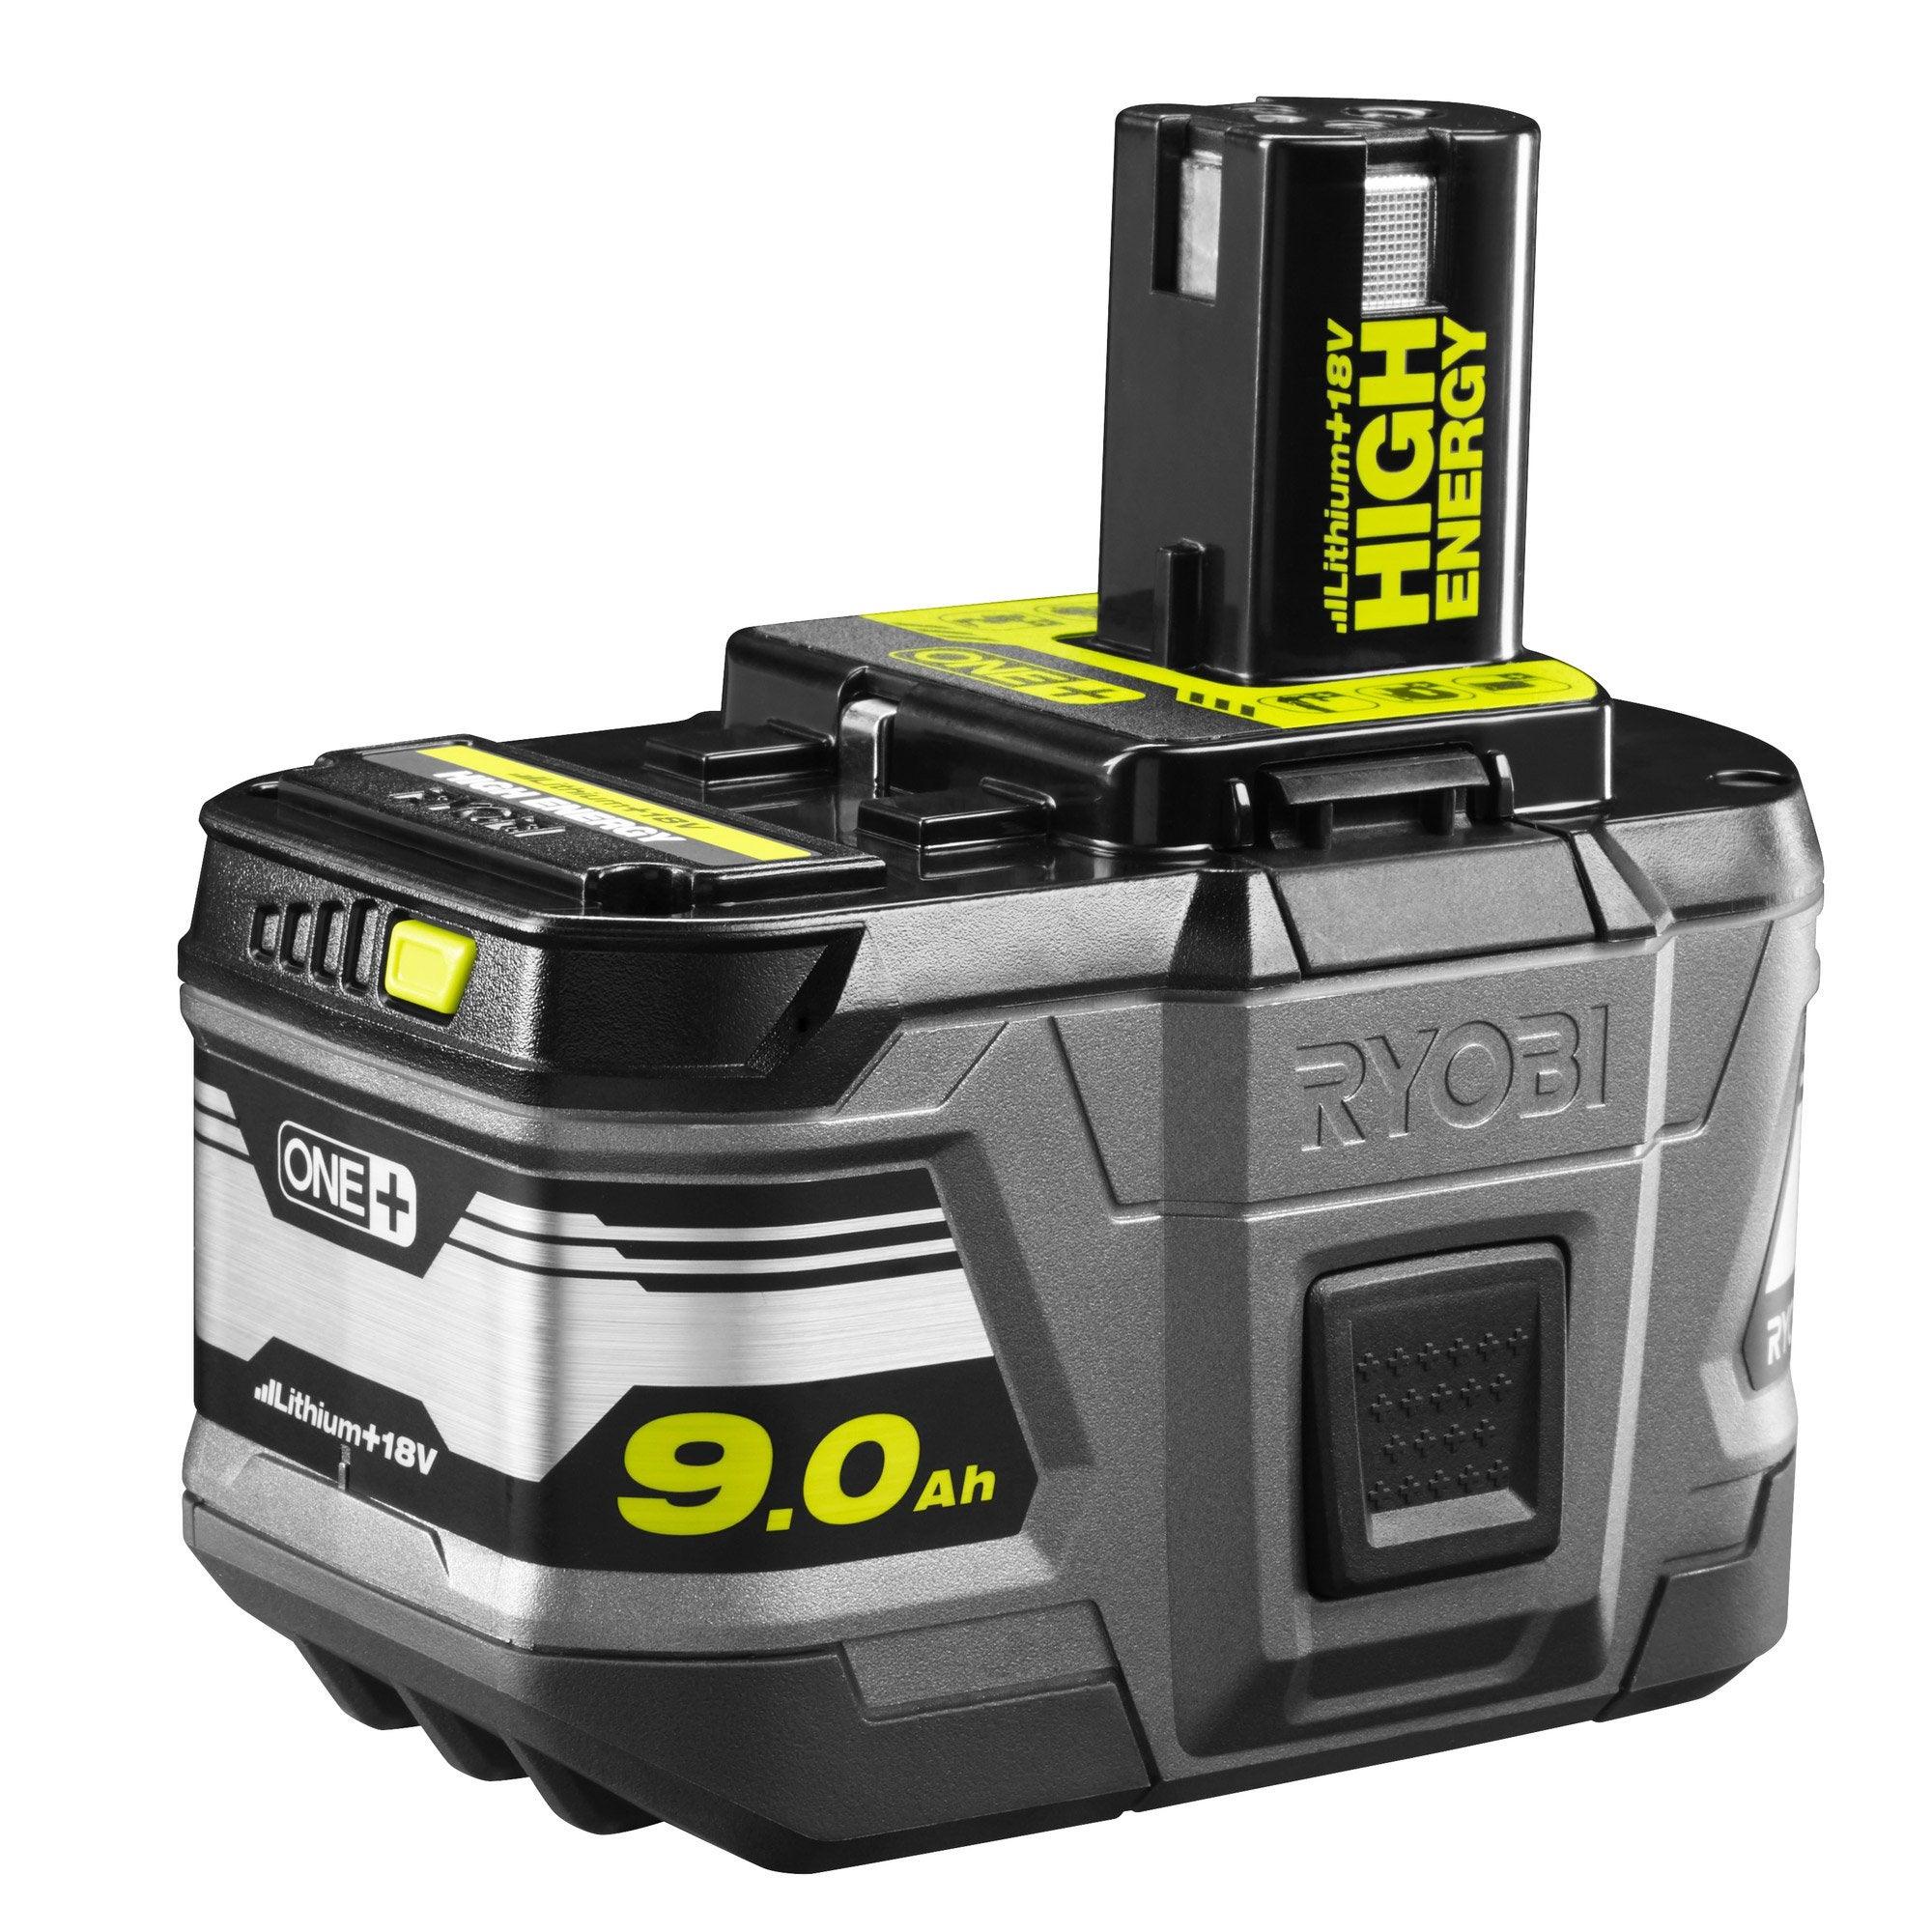 Batterie RYOBI, 18 V, 9 Ah One+ rb18l90 lithium ion | Leroy